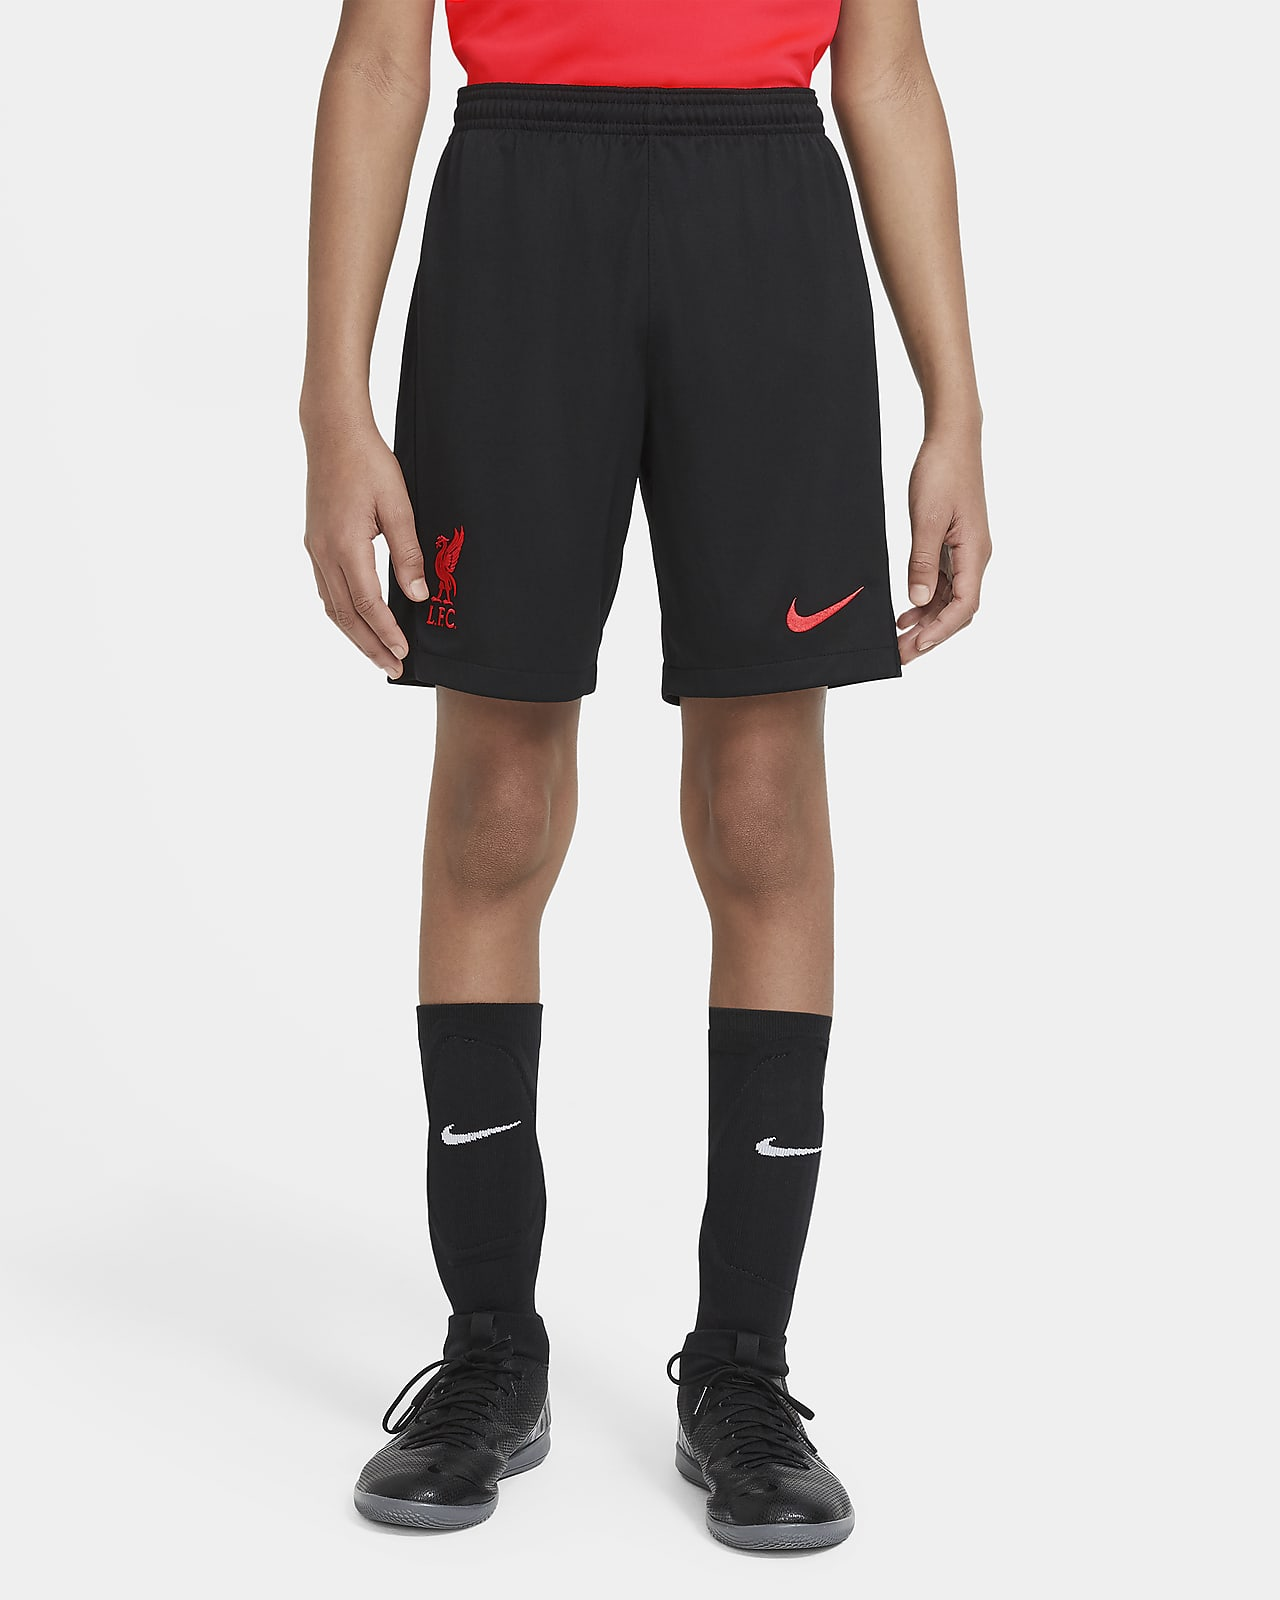 Liverpool F.C. 2020/21 Stadium Third Older Kids' Football Shorts